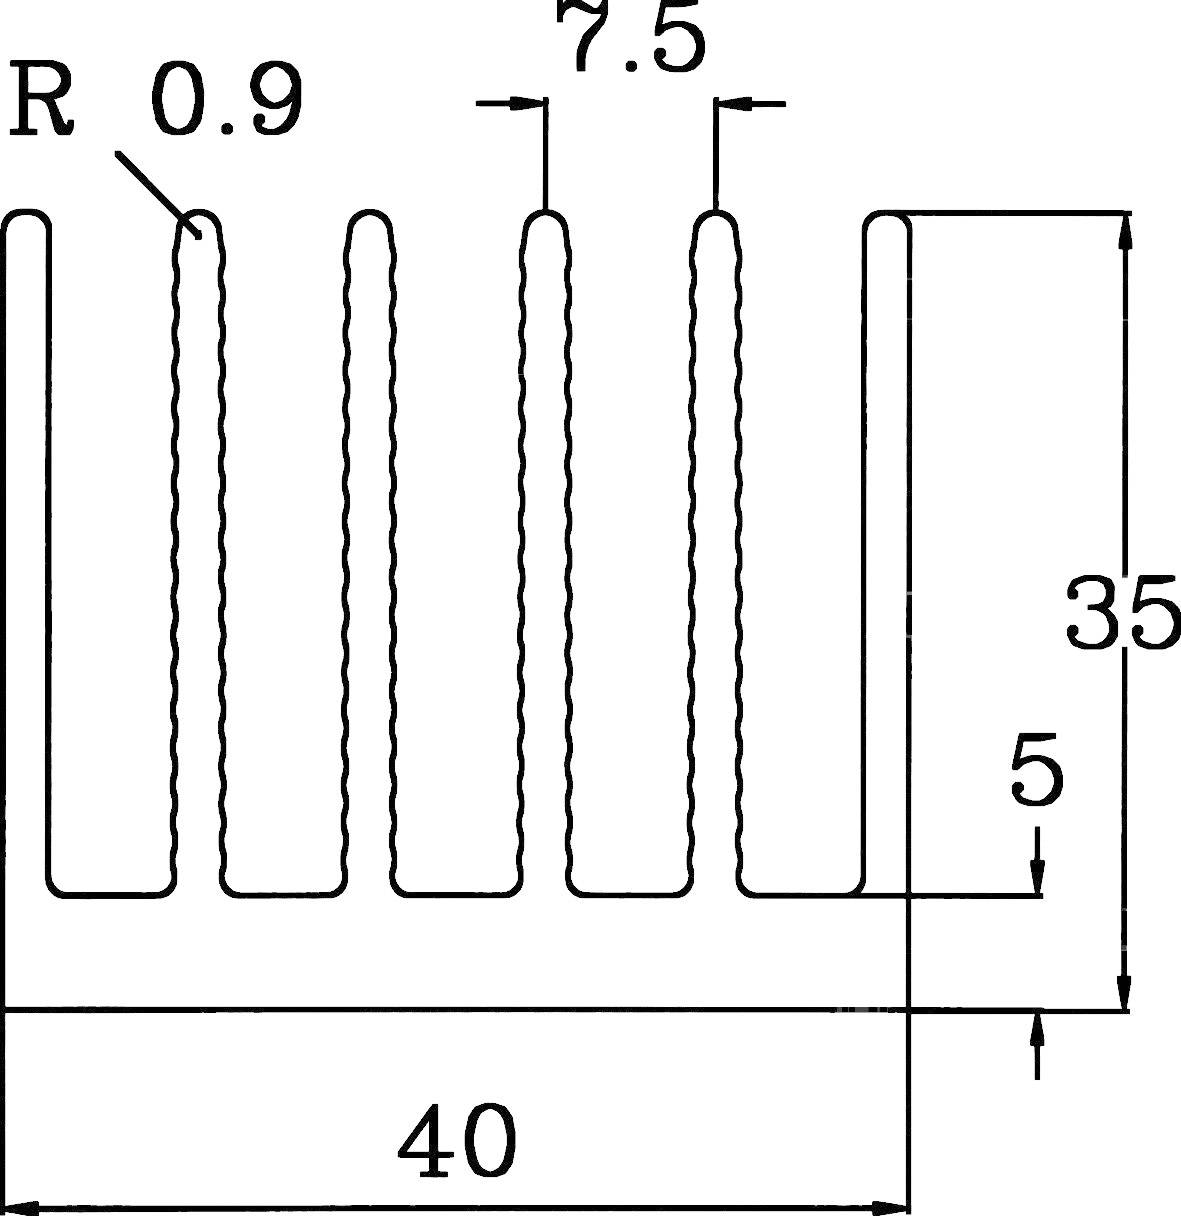 Profilový chladič Pada Engineering 8310/100/N 8310/100/N, 3.73 K/W, (d x š x v) 100 x 40 x 35 mm